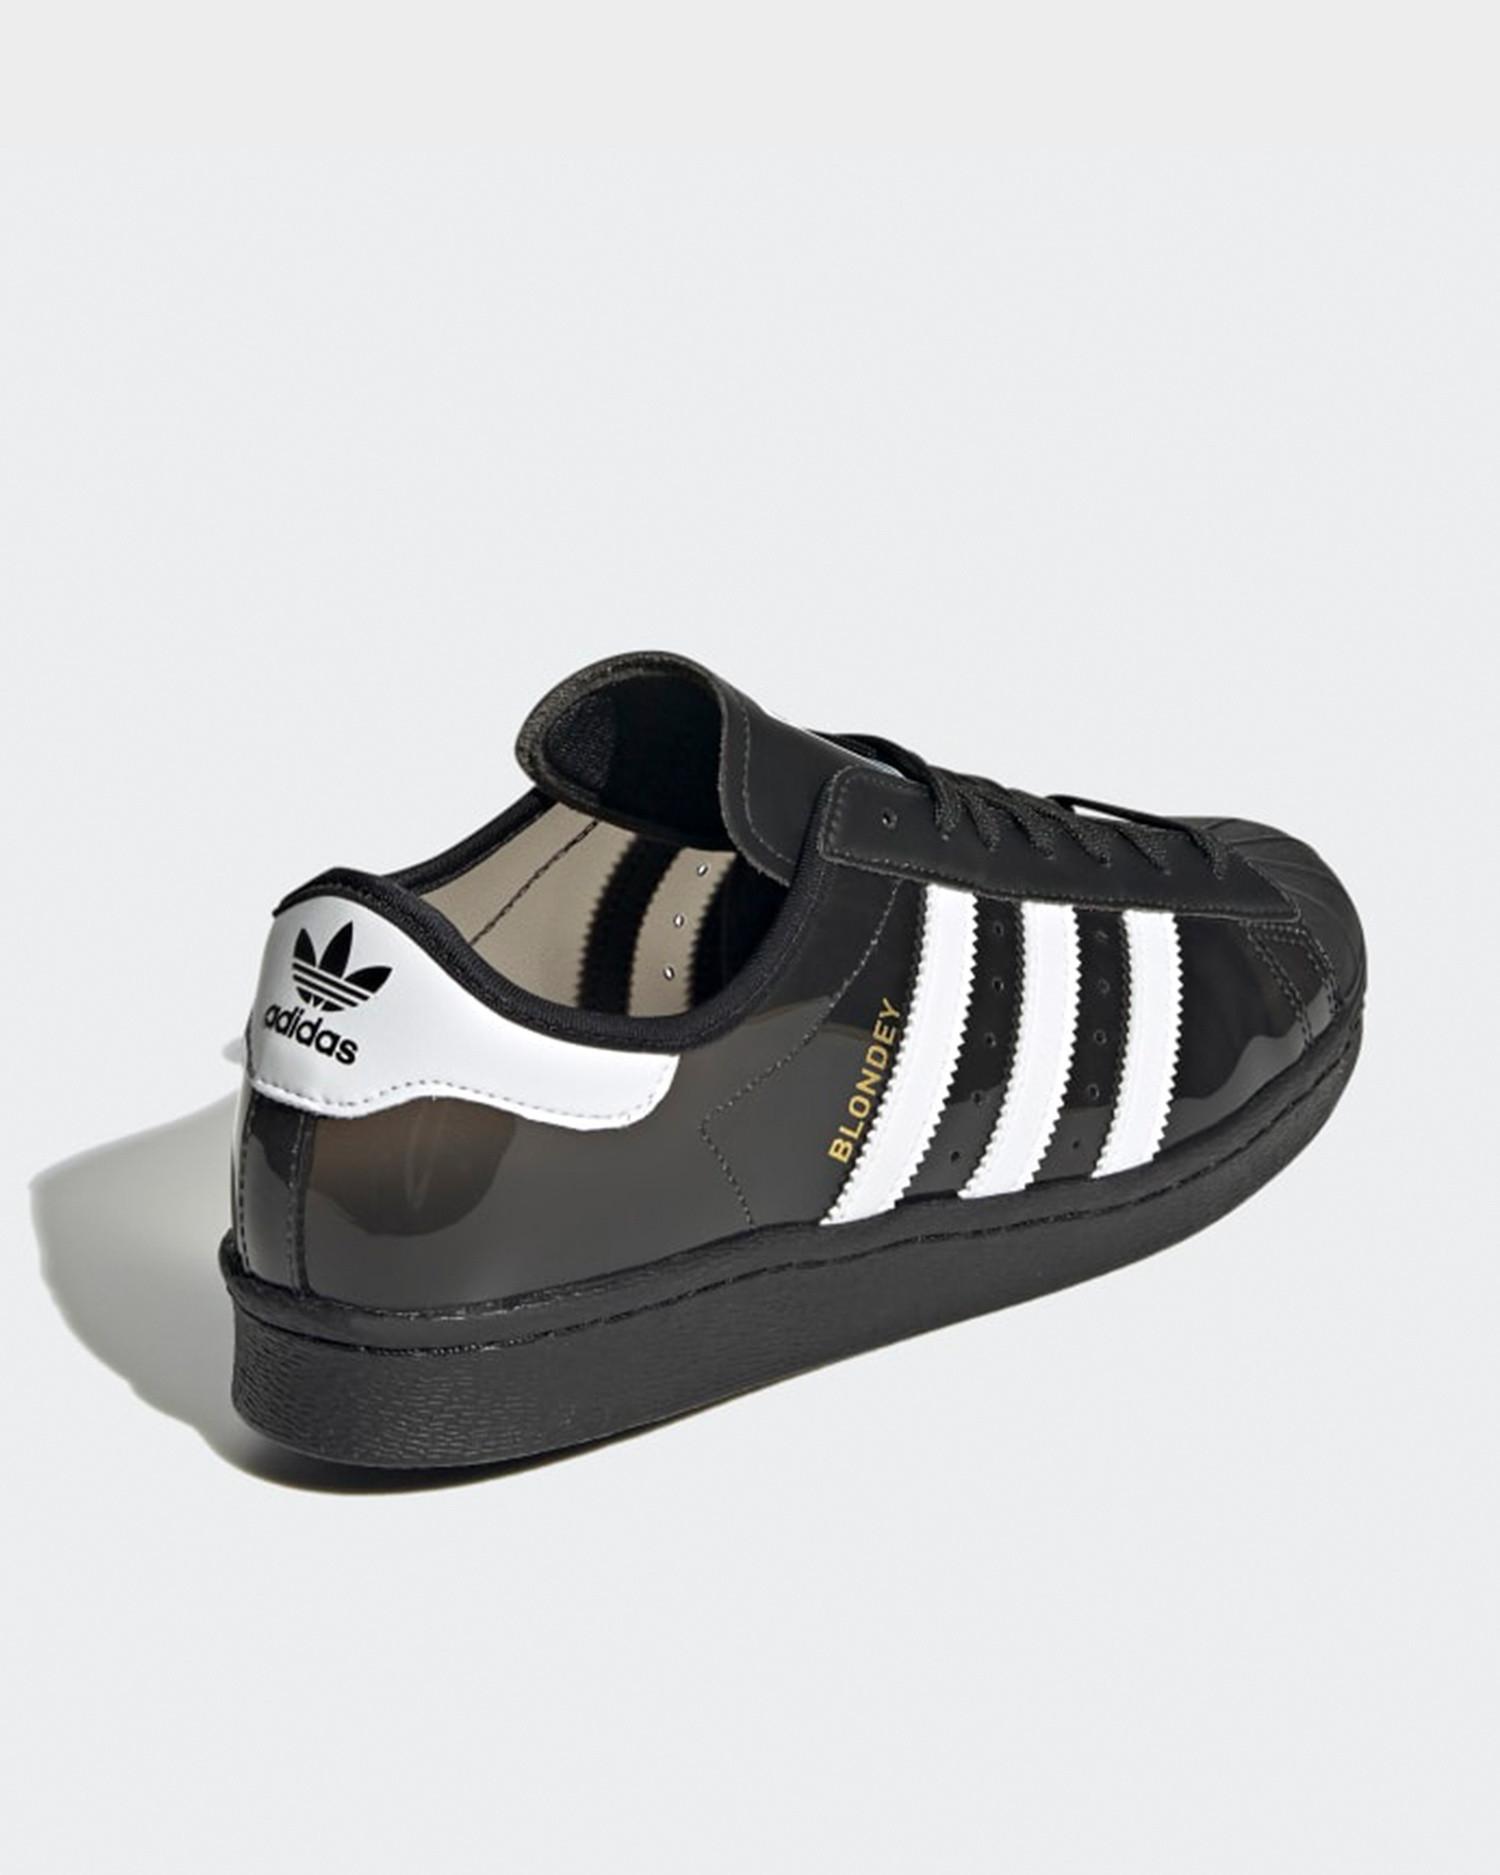 Adidas Blondey Superstar Cblack/Ftwhite/Cblack